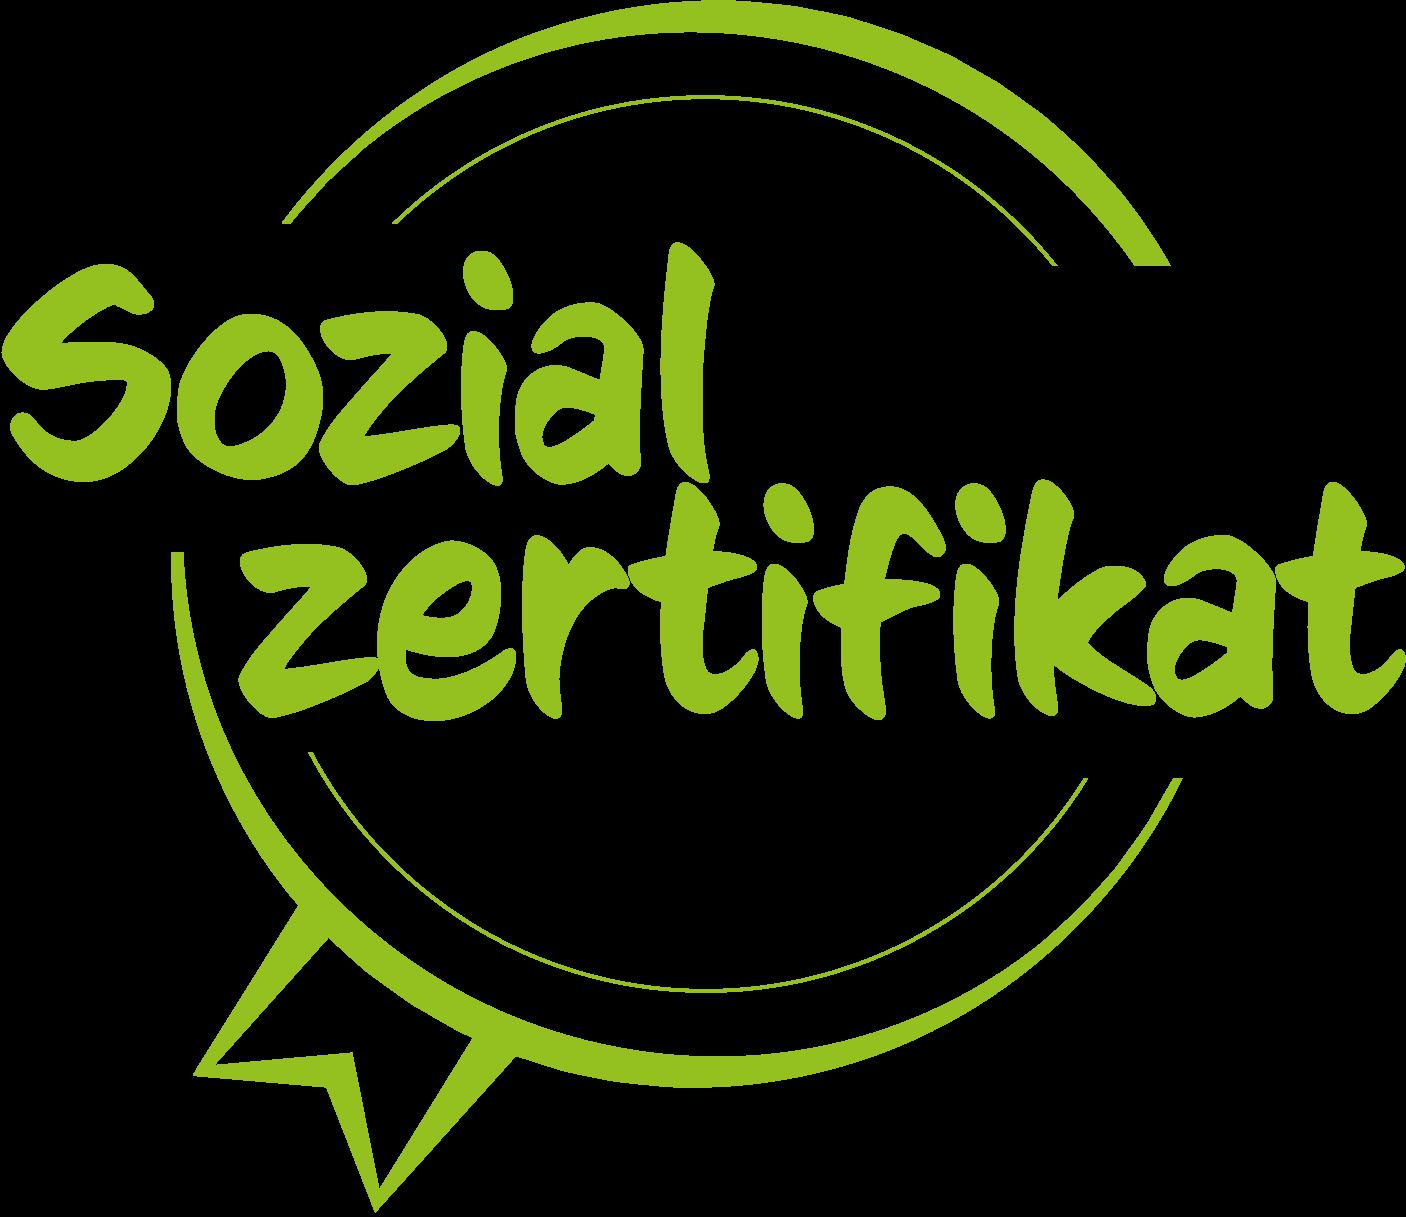 Sozialzertifikat Logo in Grün mit einem schwarzen youngCaritas Logo